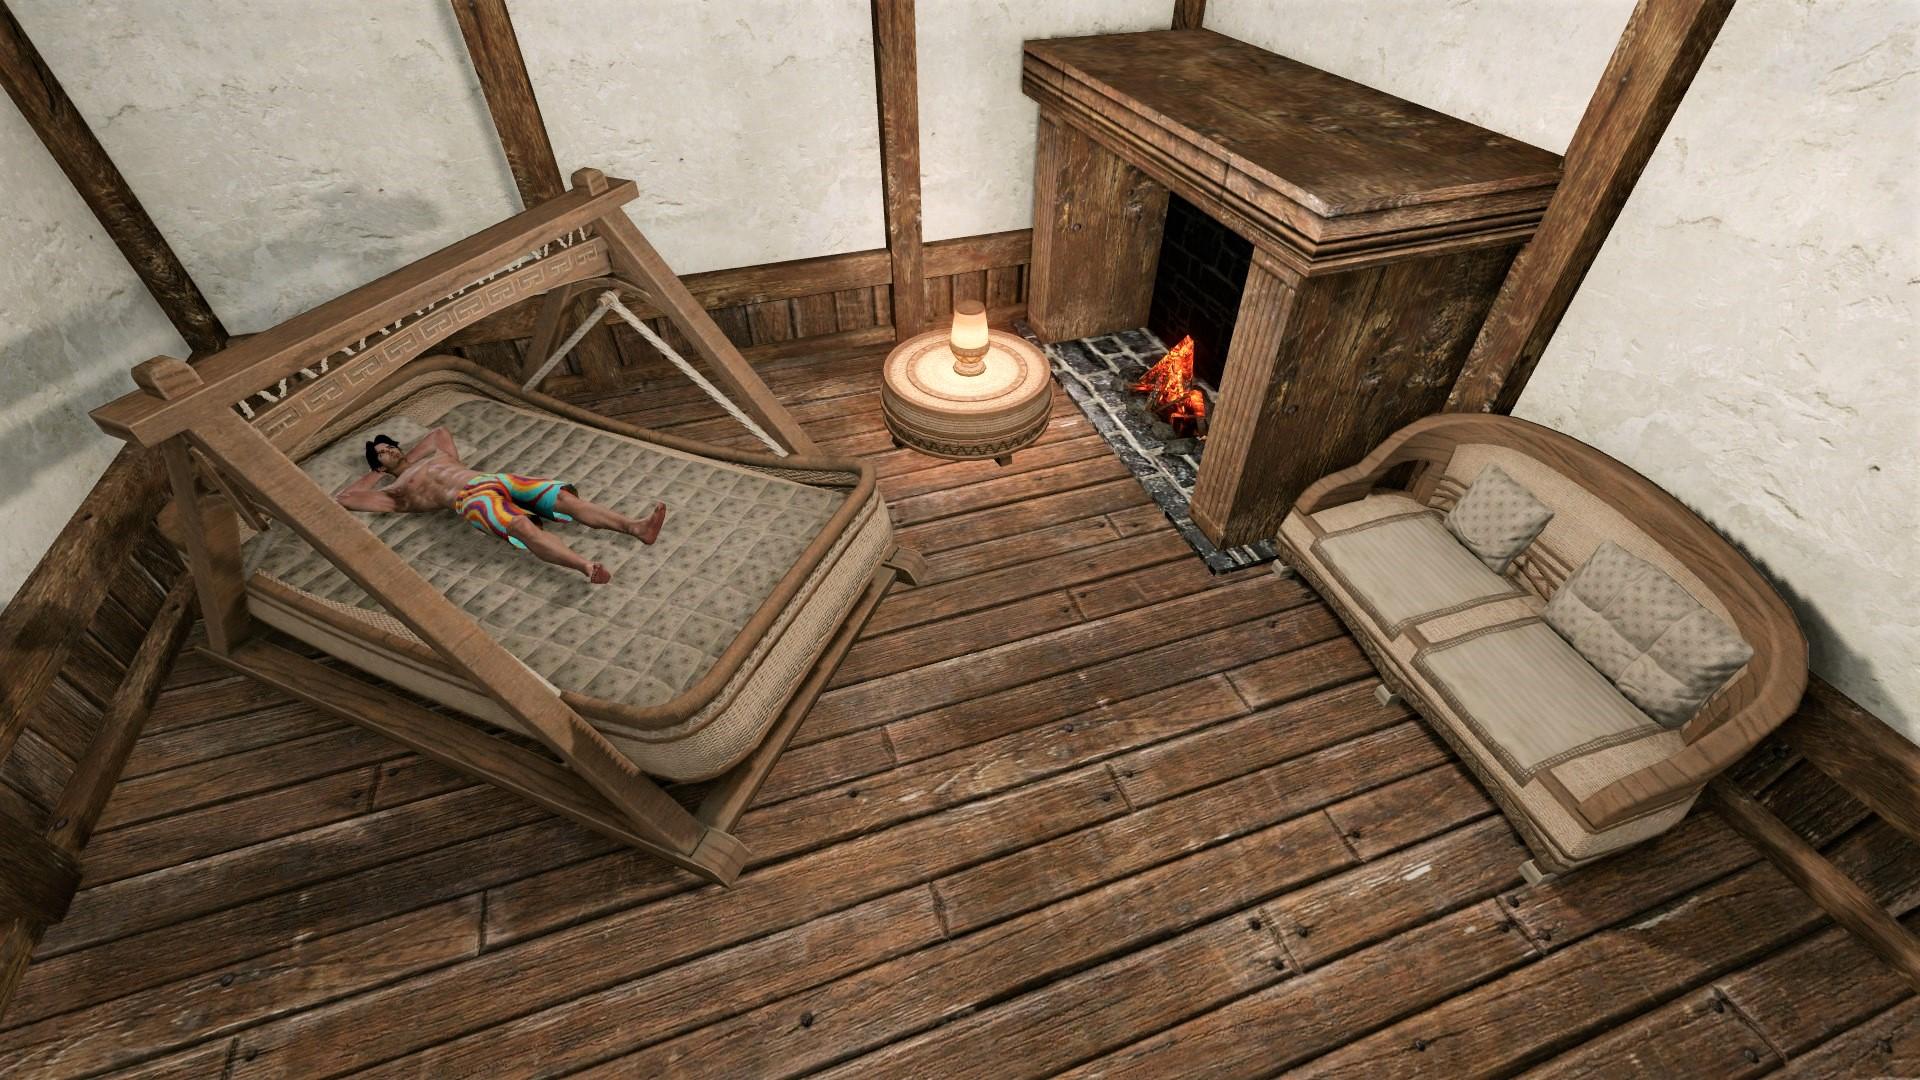 Кушетка, столик, лампа и диванчик